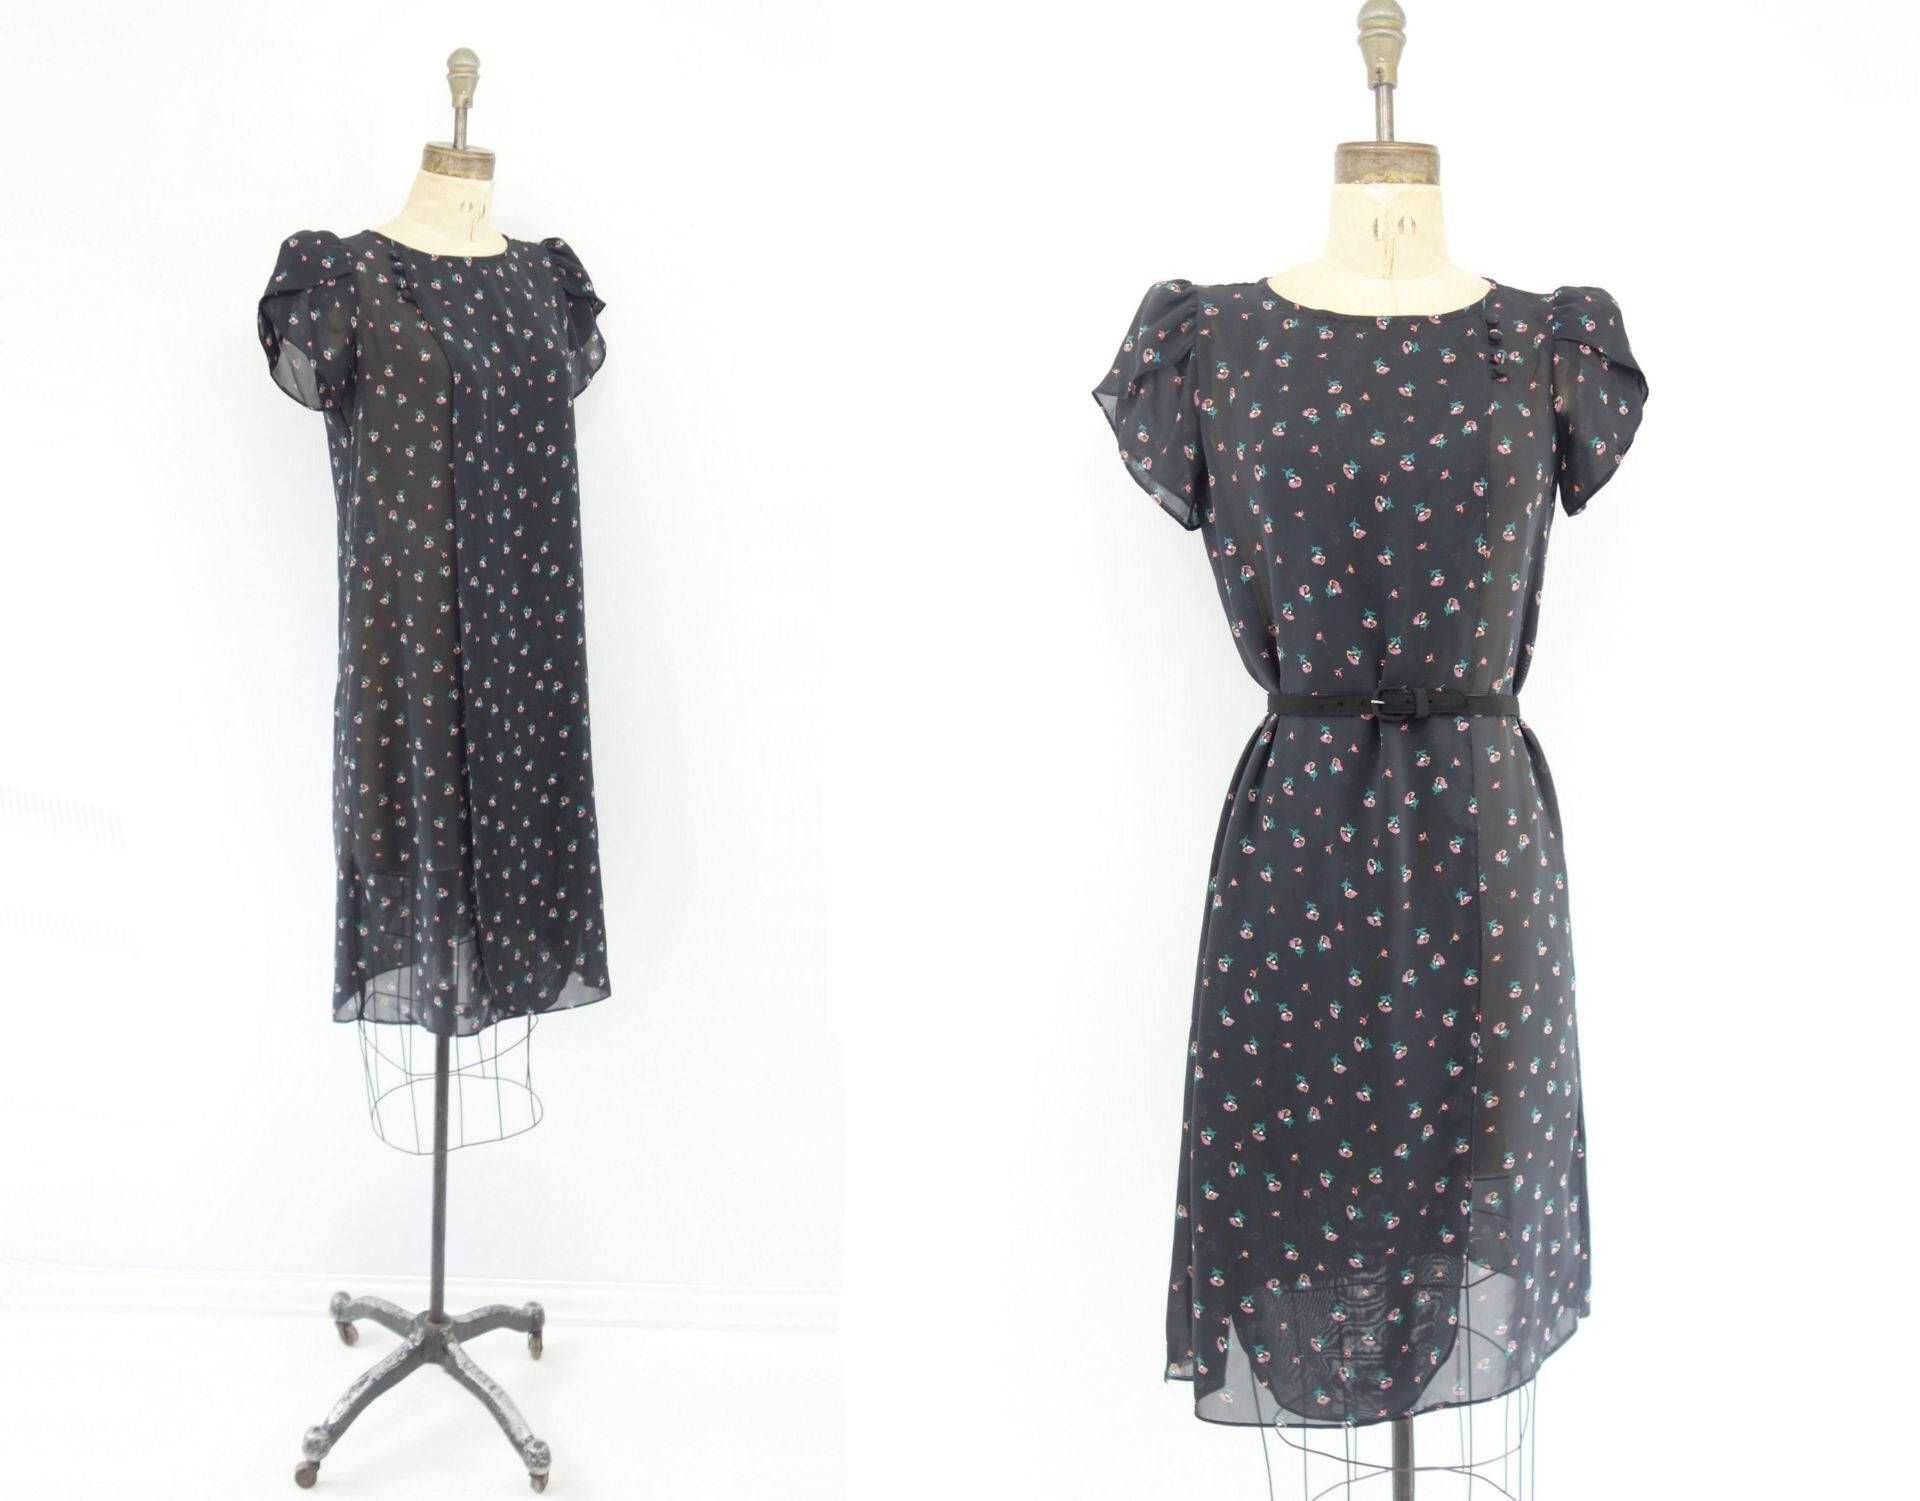 342d0485ffd Black Floral Dress Vintage 80s Dress 80s Party Dress Puff Sleeve Dress 80s  Summer Dress Sheer